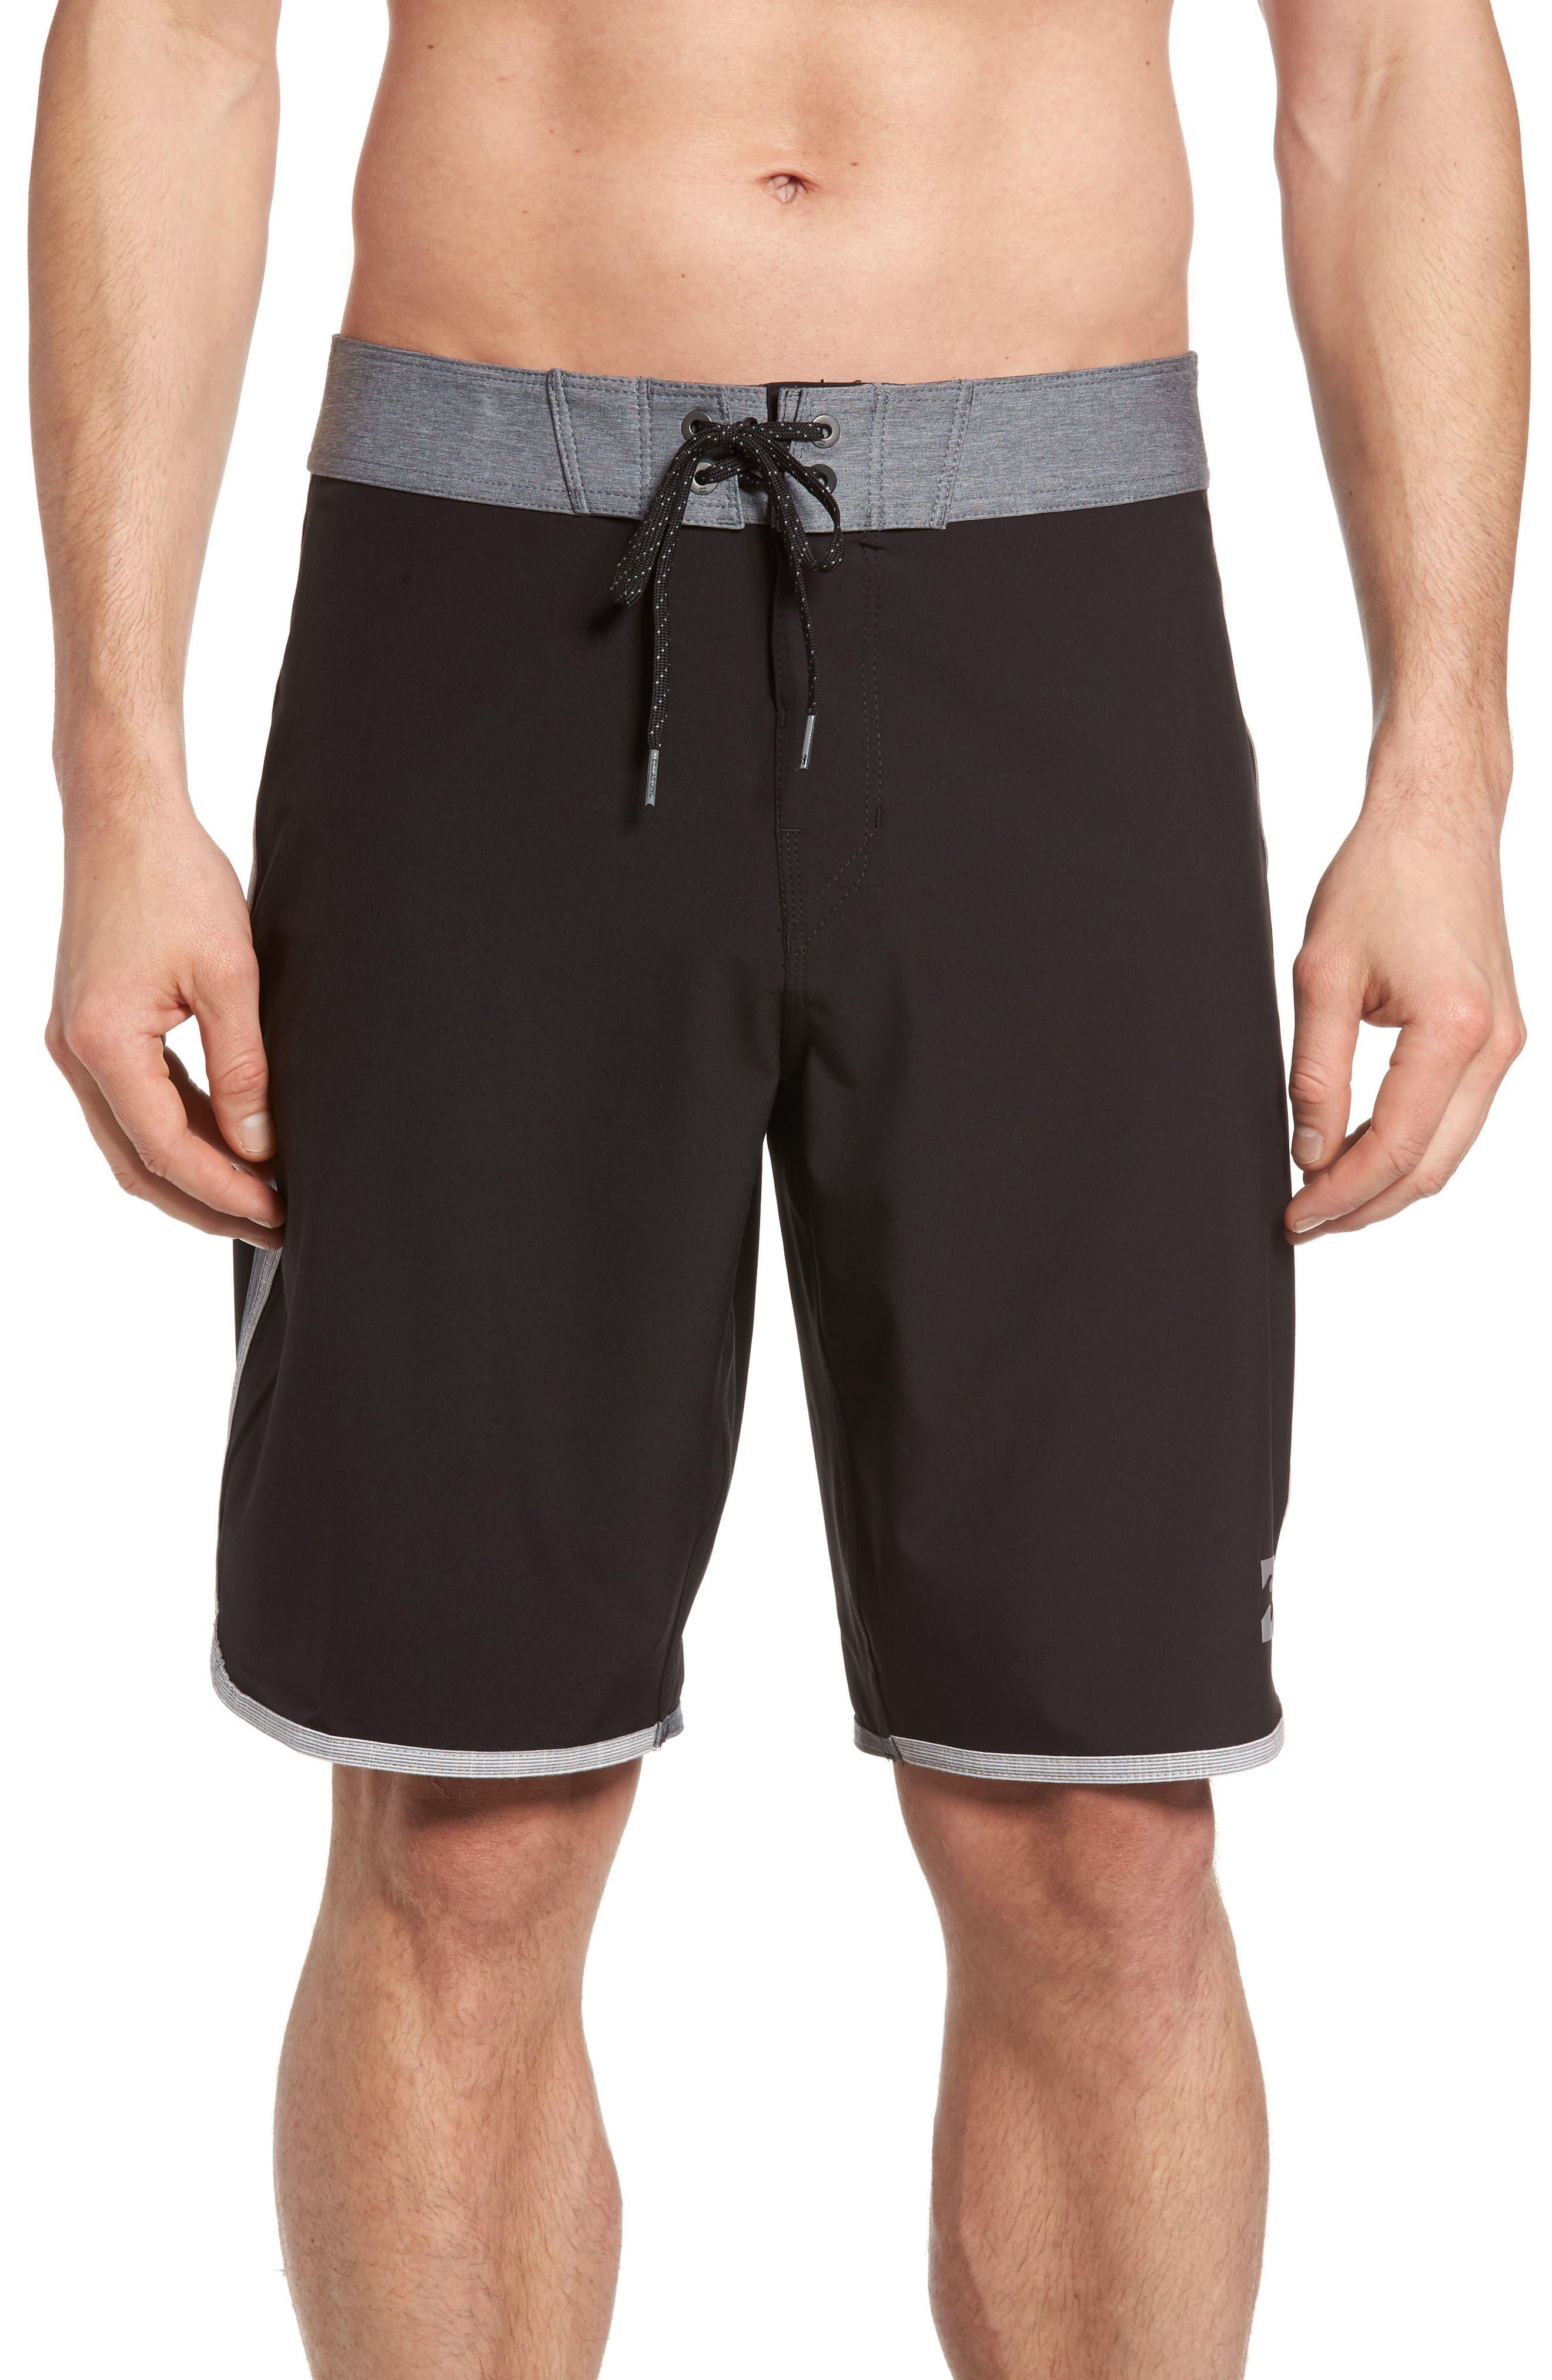 Billabong 73 X Board Shorts (Regular & Big)